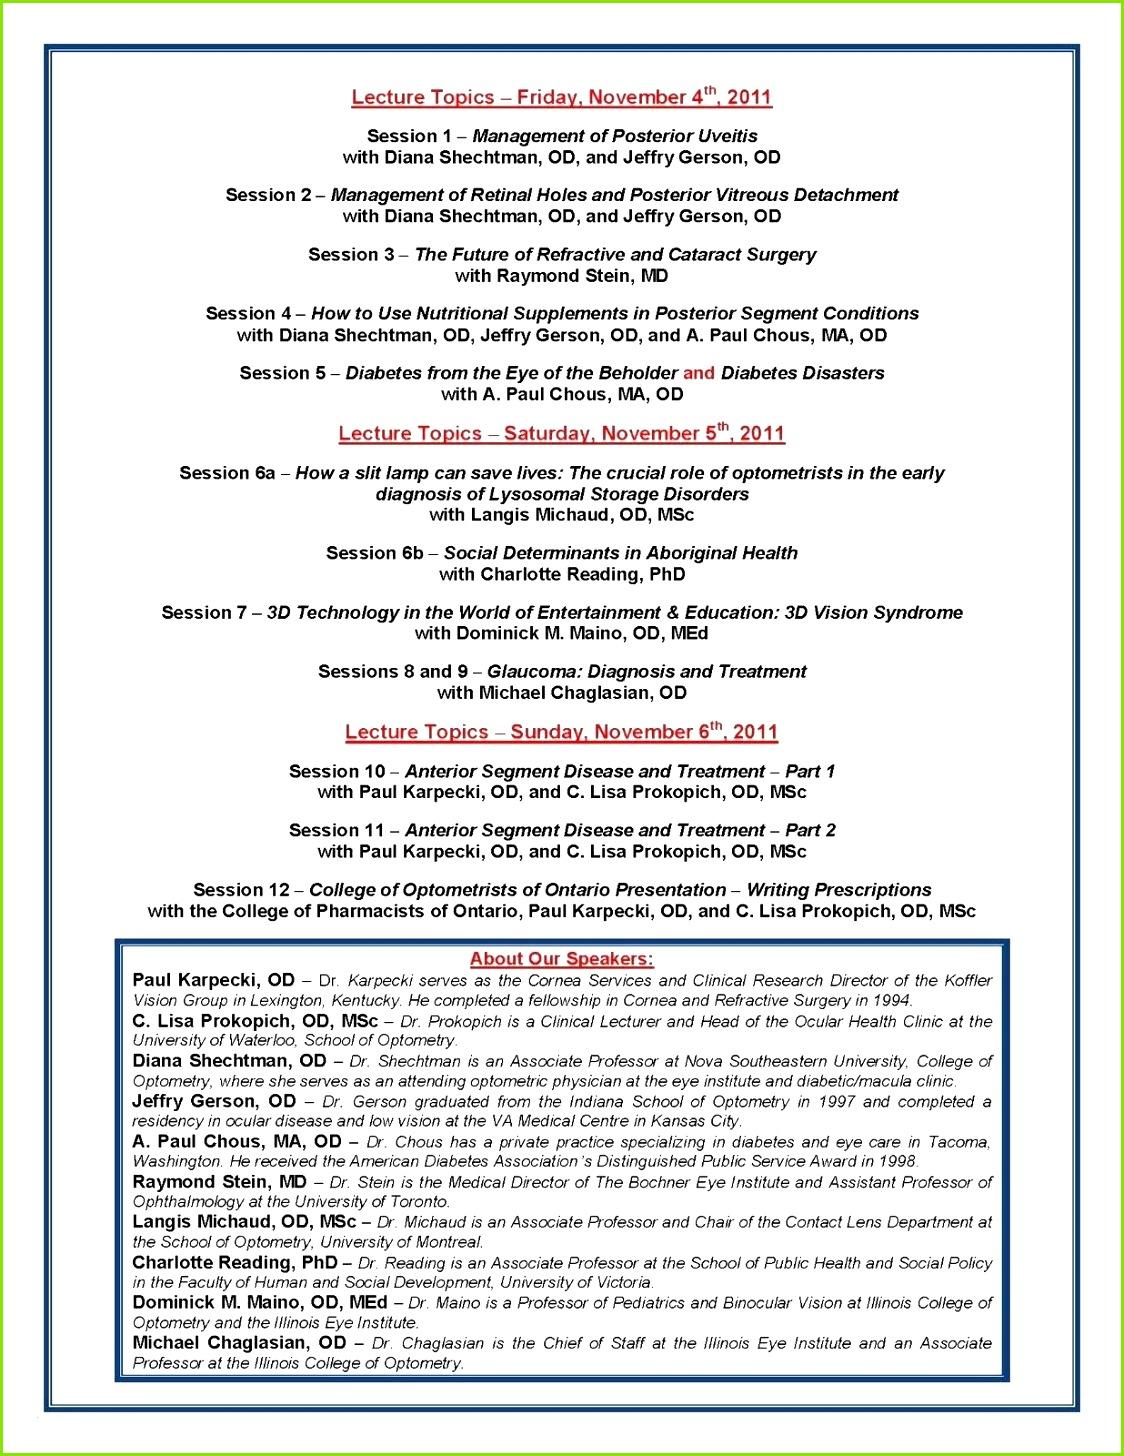 Resume Sample Event Coordinator New Event Planner Resume Refrence Event Planner Cover Letter Sample Best